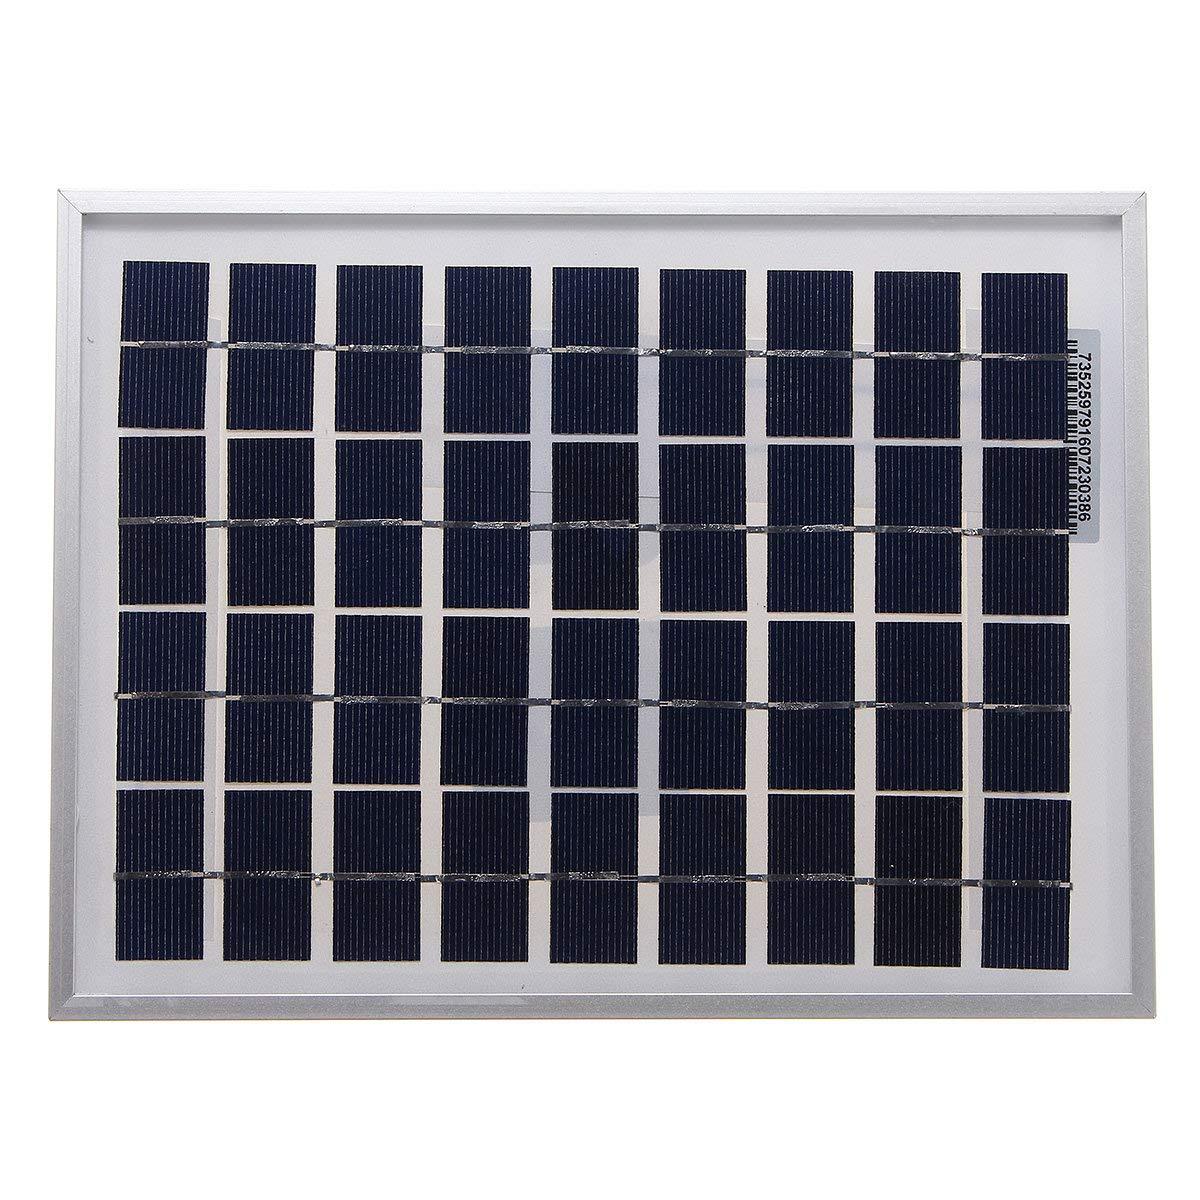 5W 18V Polycrystalline Solar Panel for 12V Battery - Arduino Compatible SCM & DIY Kits Smart Robot & Solar Panel - 1 x 5W Solar Panel